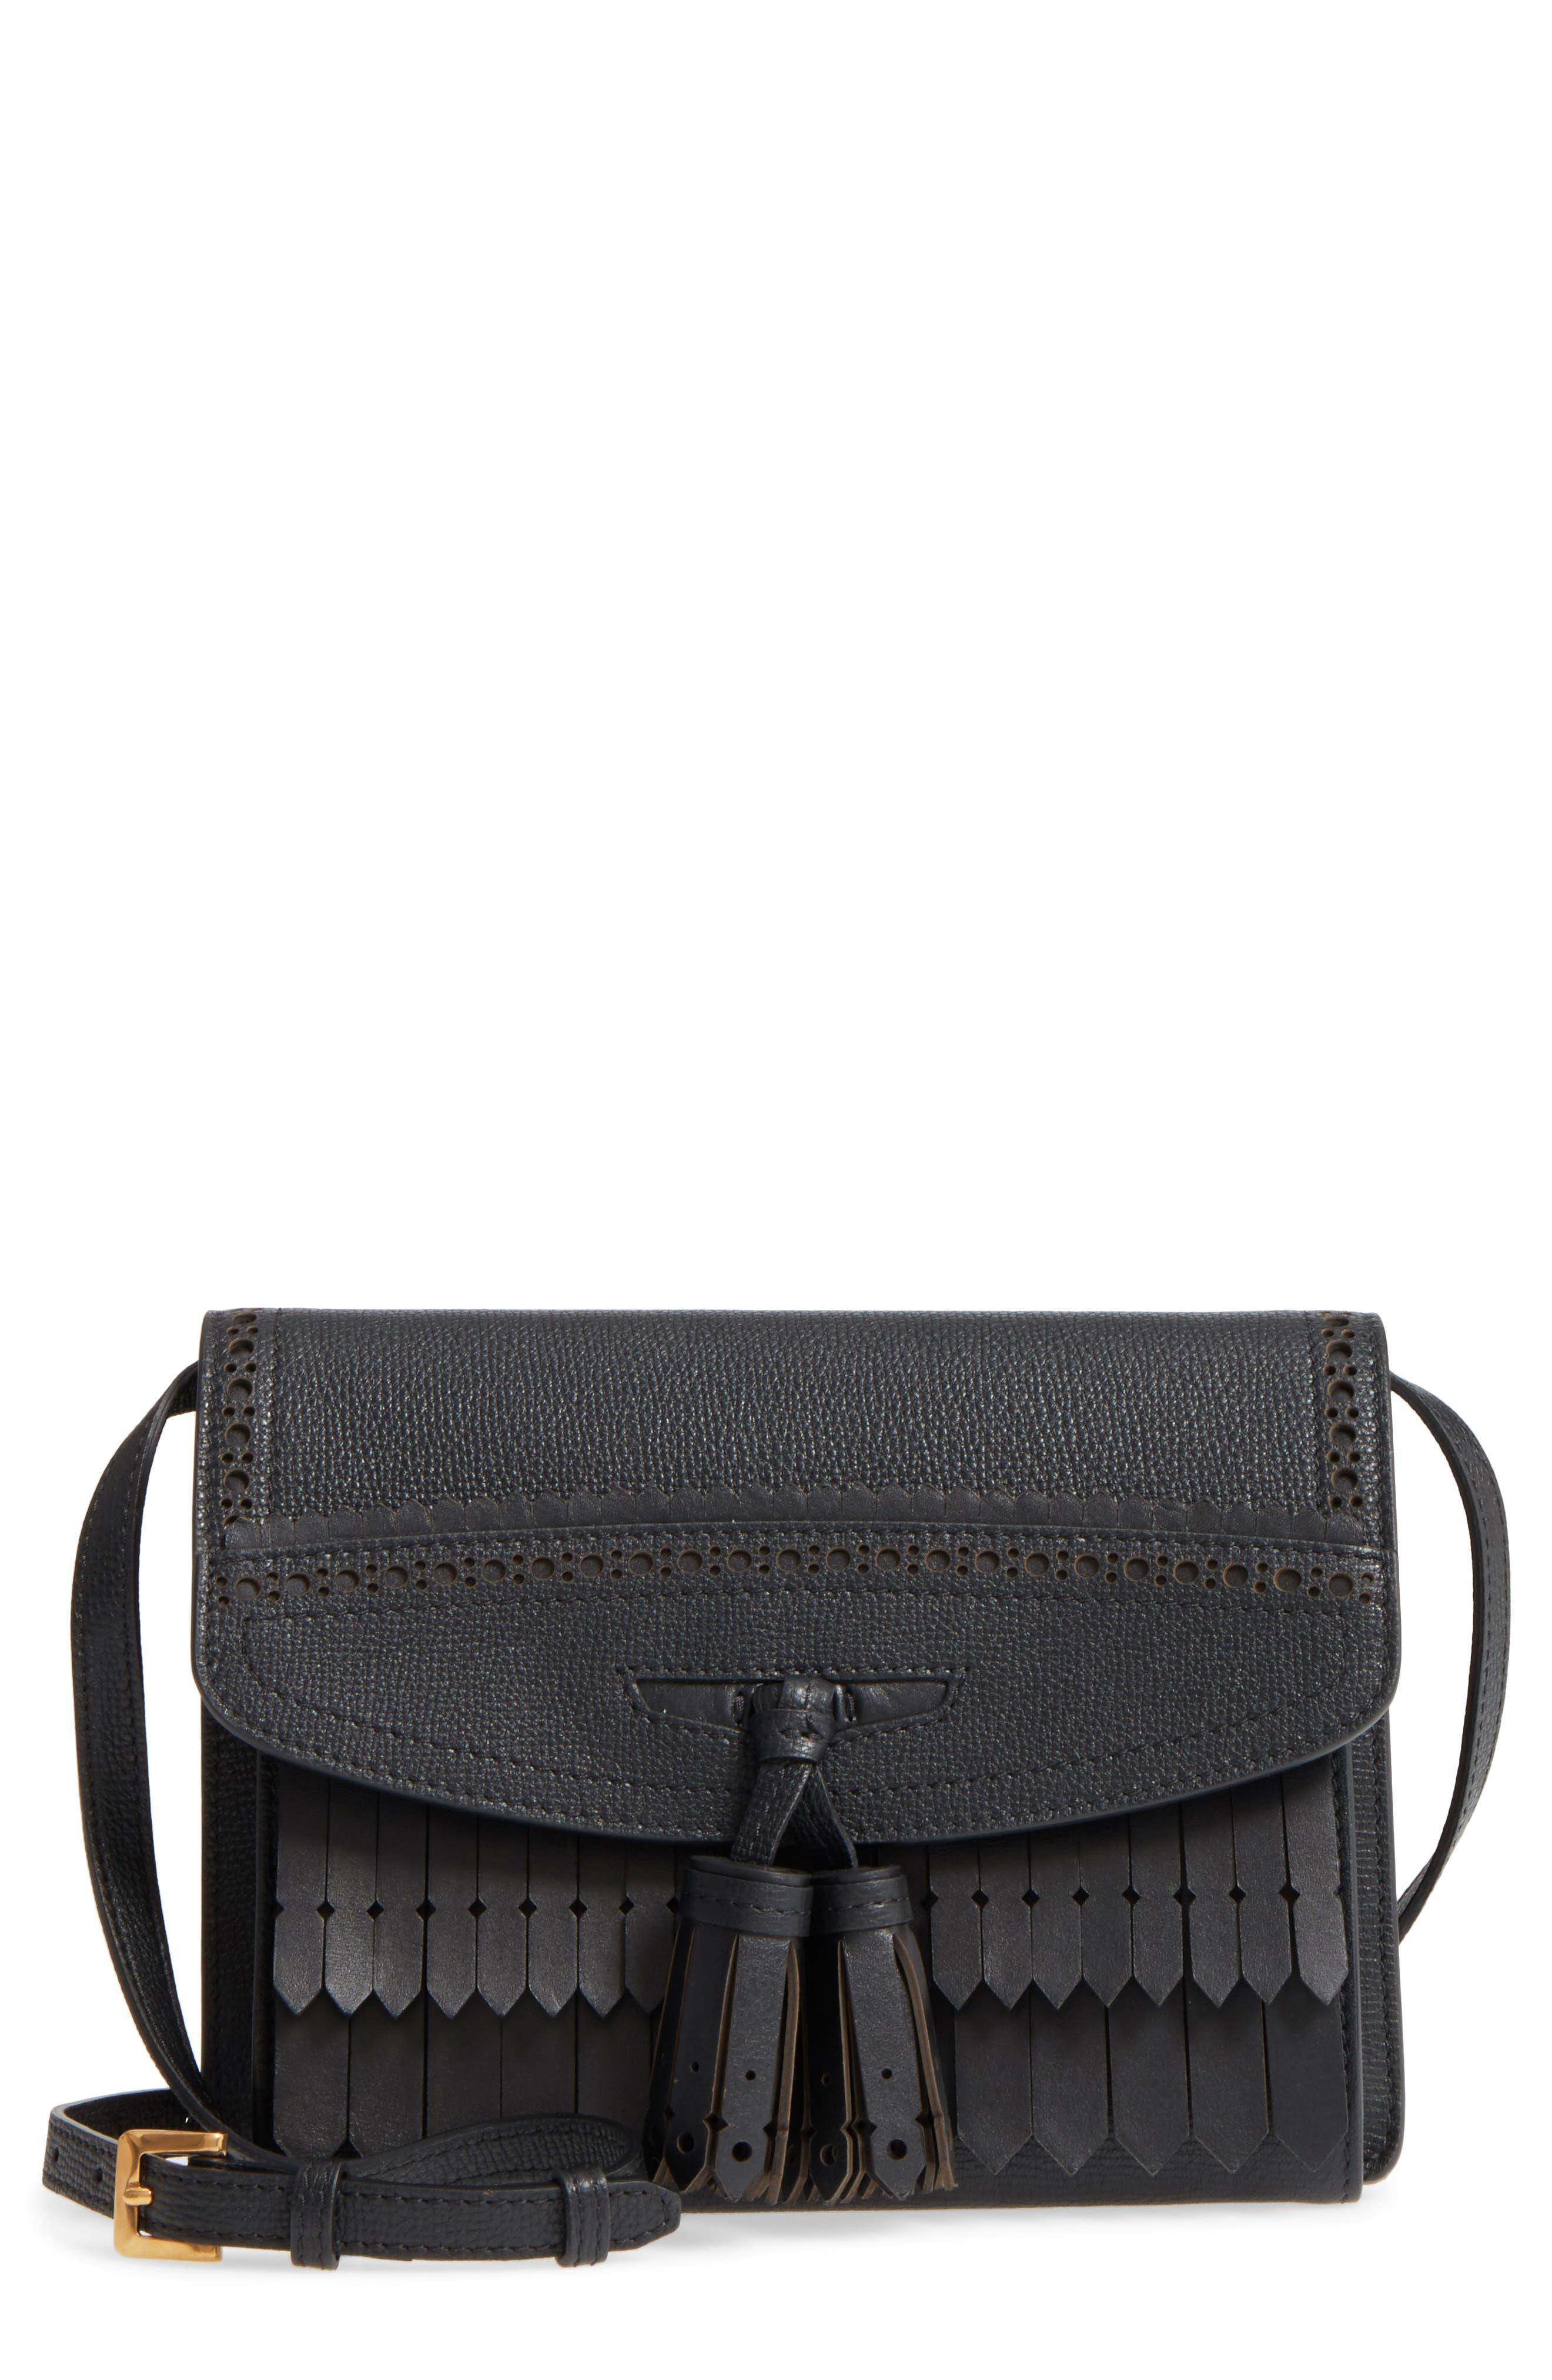 Macken Fringe Leather Crossbody Bag,                         Main,                         color, Black